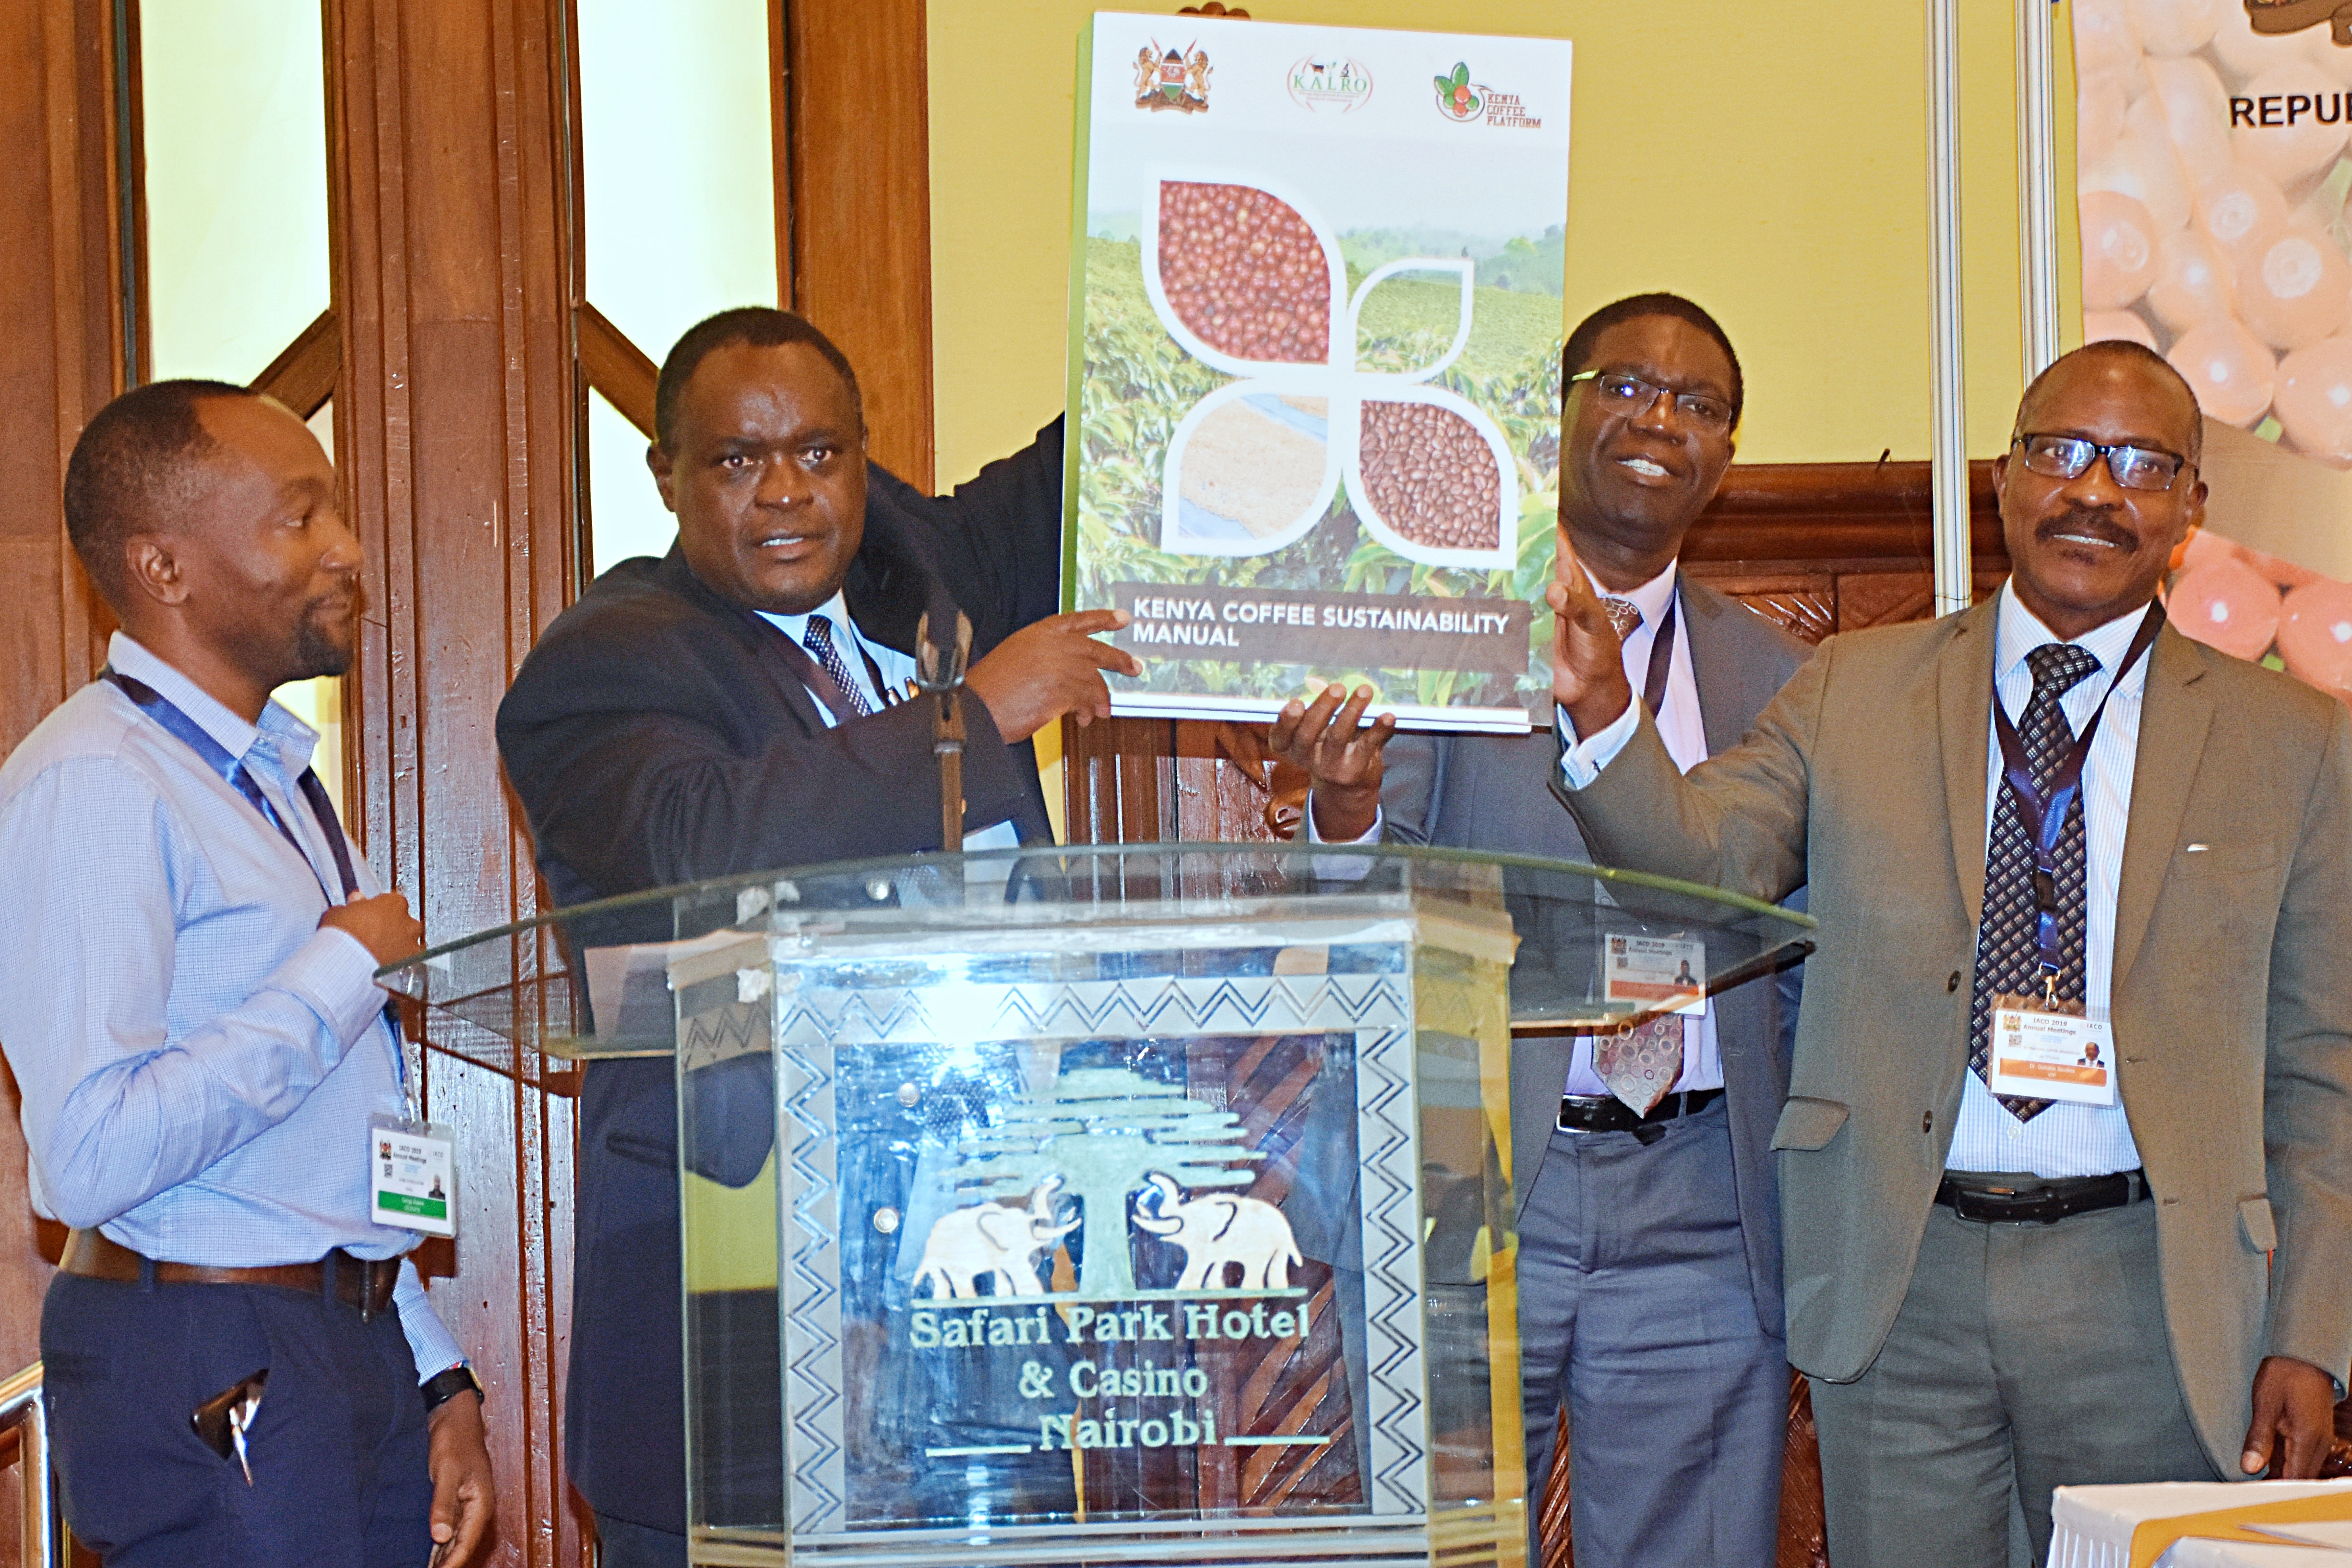 Kenyas-Coffee-Sustainability-Manual.jpg#asset:18337